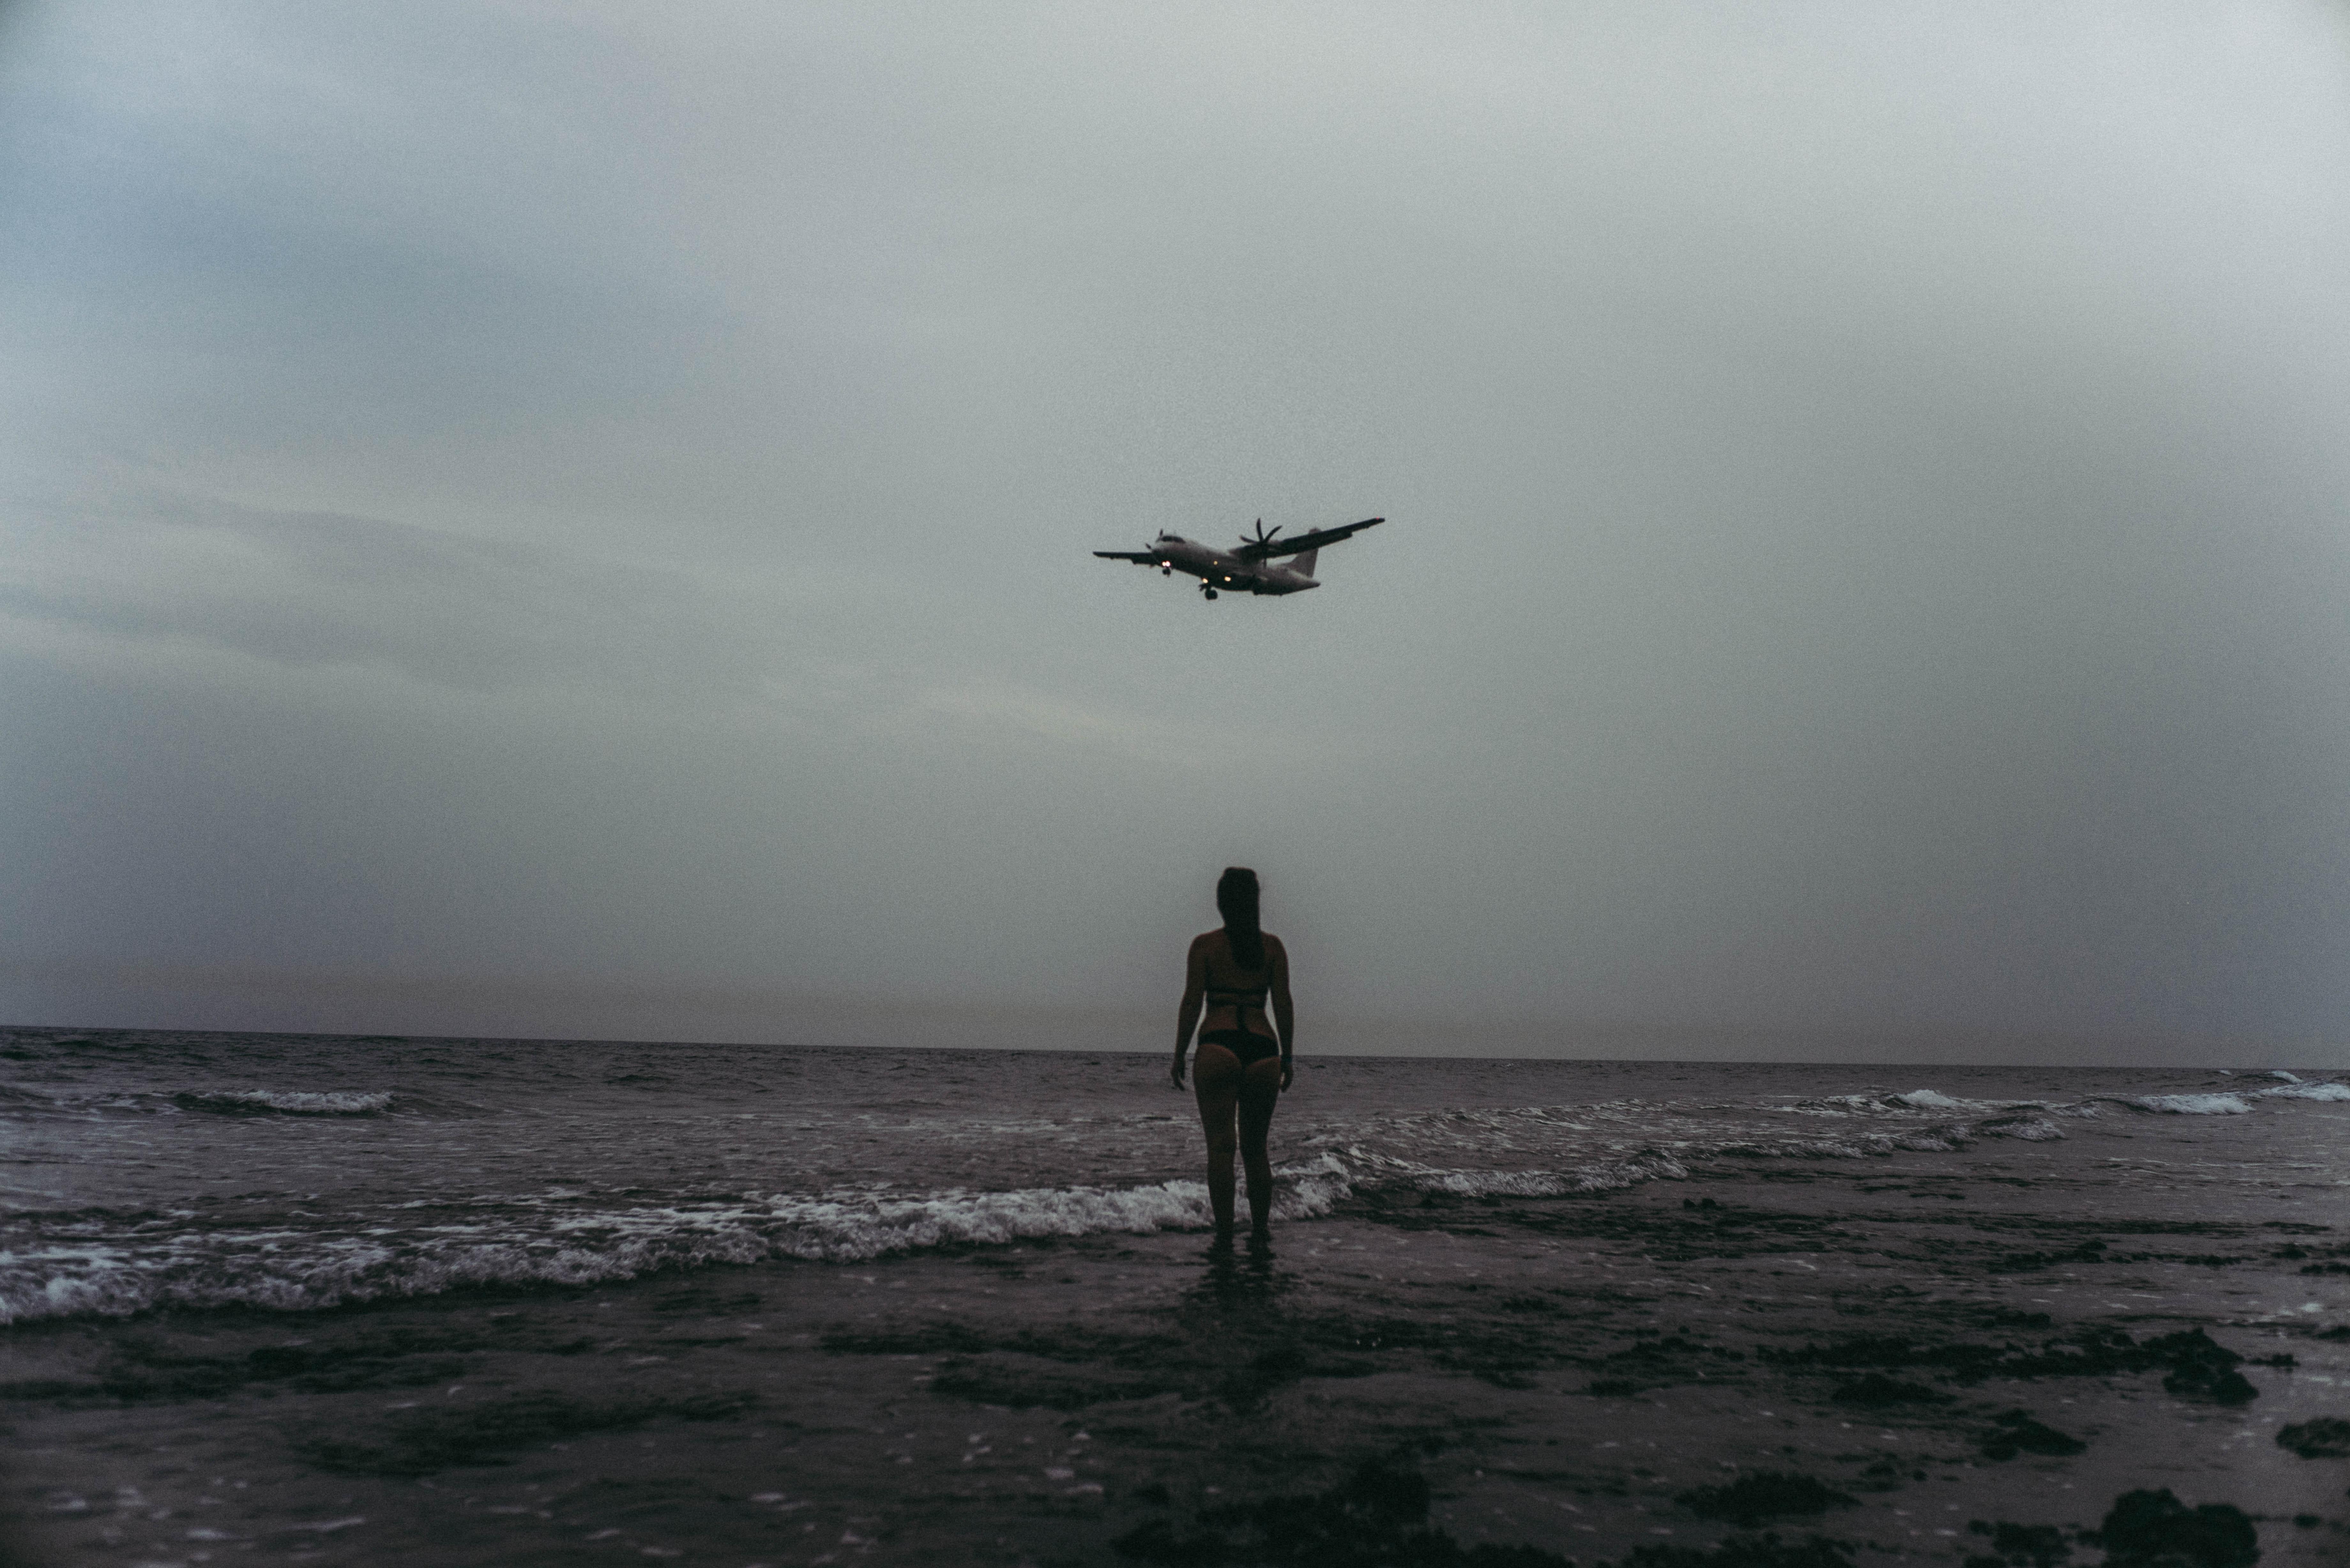 Grayscale Photography Of Woman On Seashore, Aeroplane, Monochrome, Water, Sky, HQ Photo